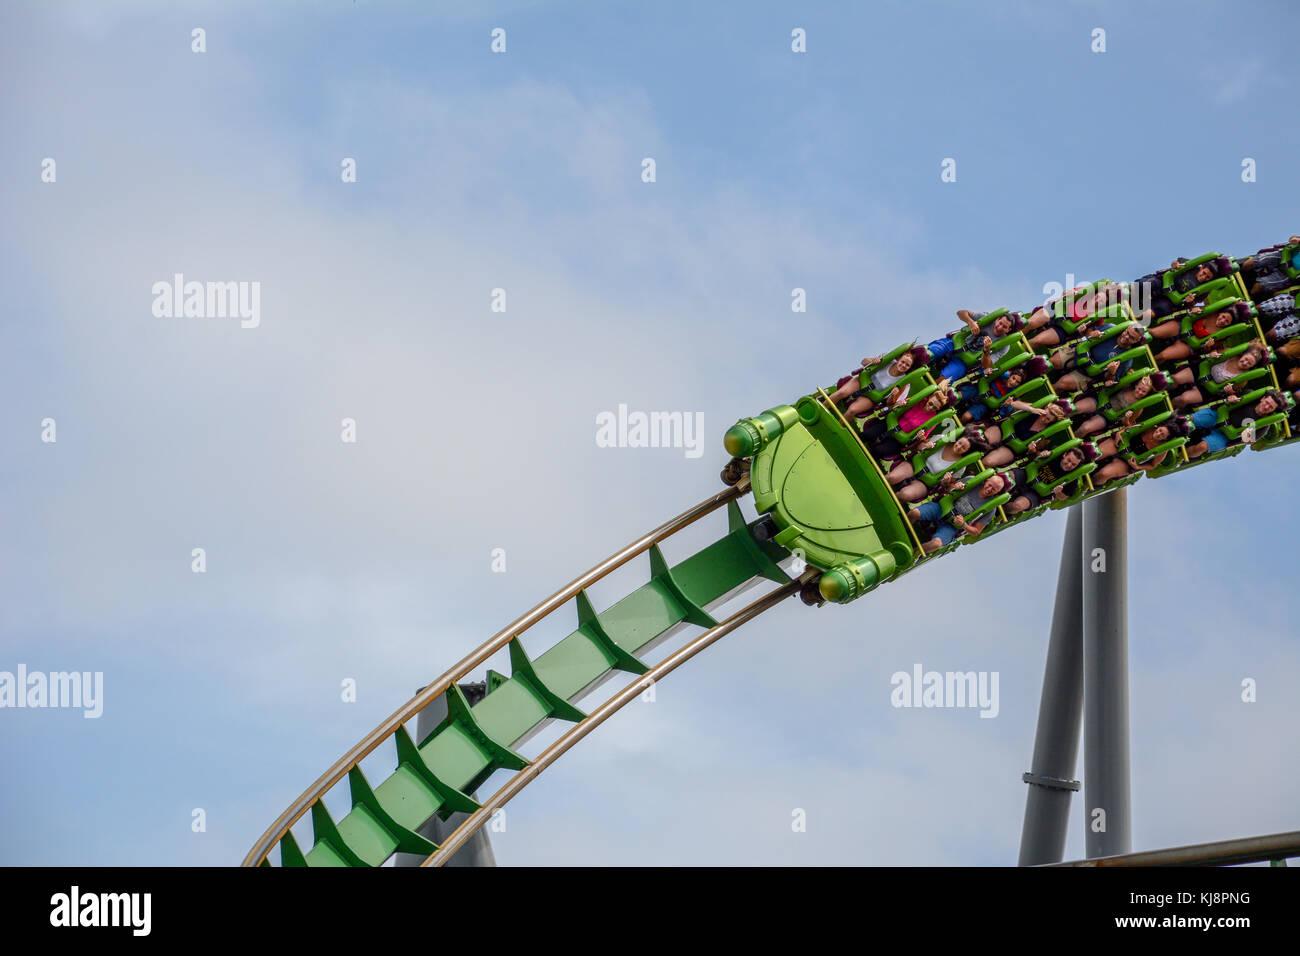 Riding a Roller Coaster - Stock Image